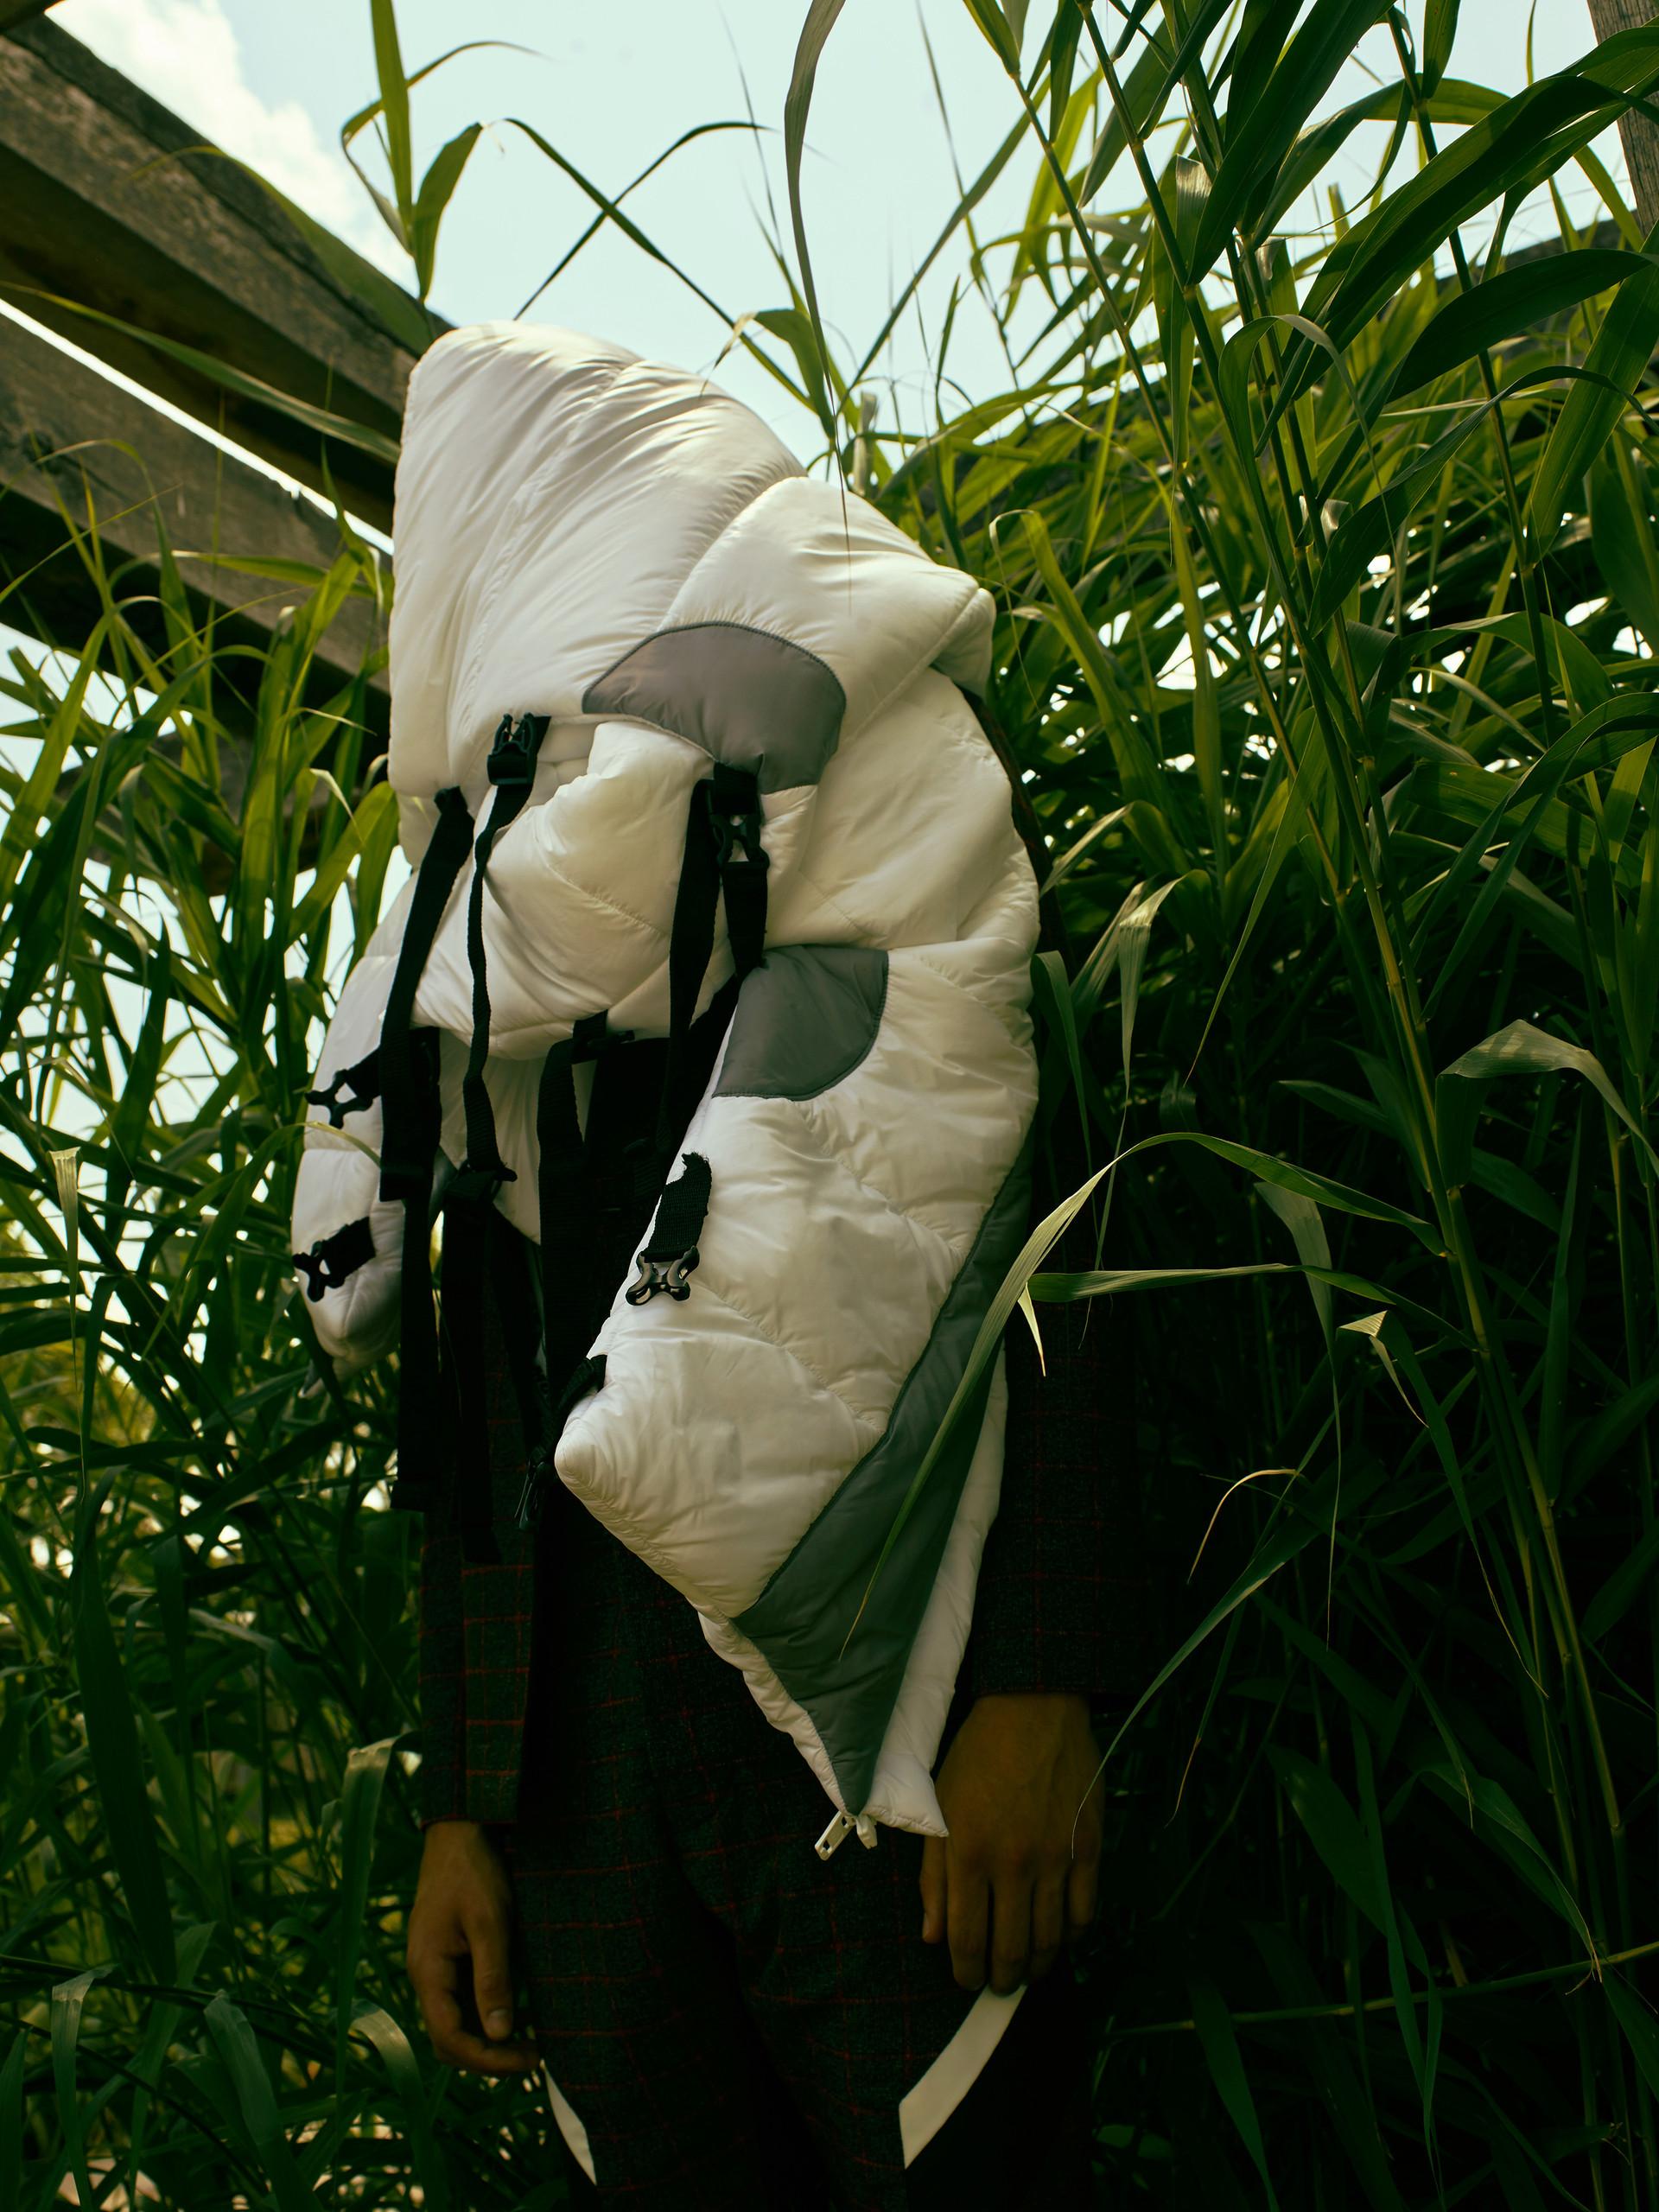 01_In my leady garden_CF207139.jpg